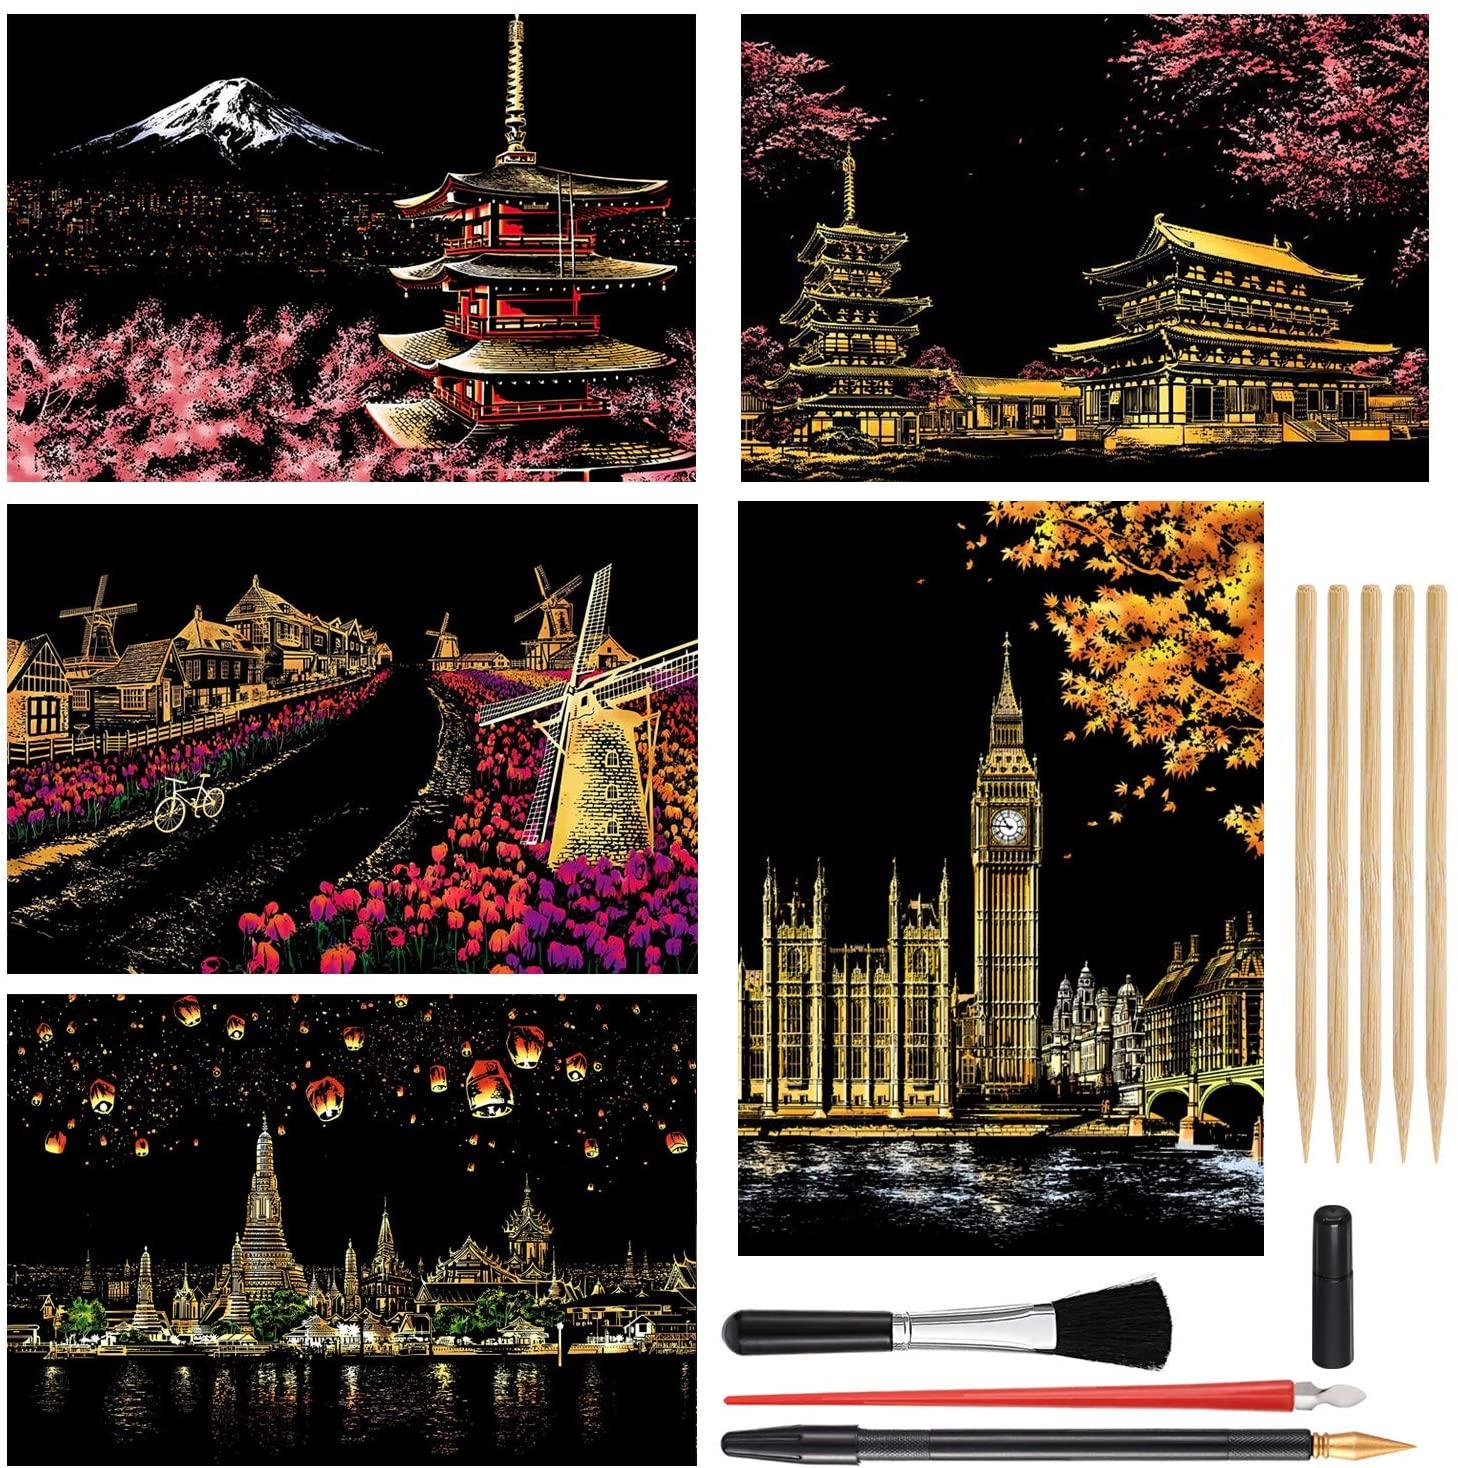 MIASTAR Scratch Painting Kits, Craft Art Set for Adults & Kids, Rainbow Scratch Painting Paper 16''x11.2'', DIY Scratchboard, 5 Pack with 9 Tools(Mount Fuji / Sakura / Holland / Big Ben / Chiang Mai)